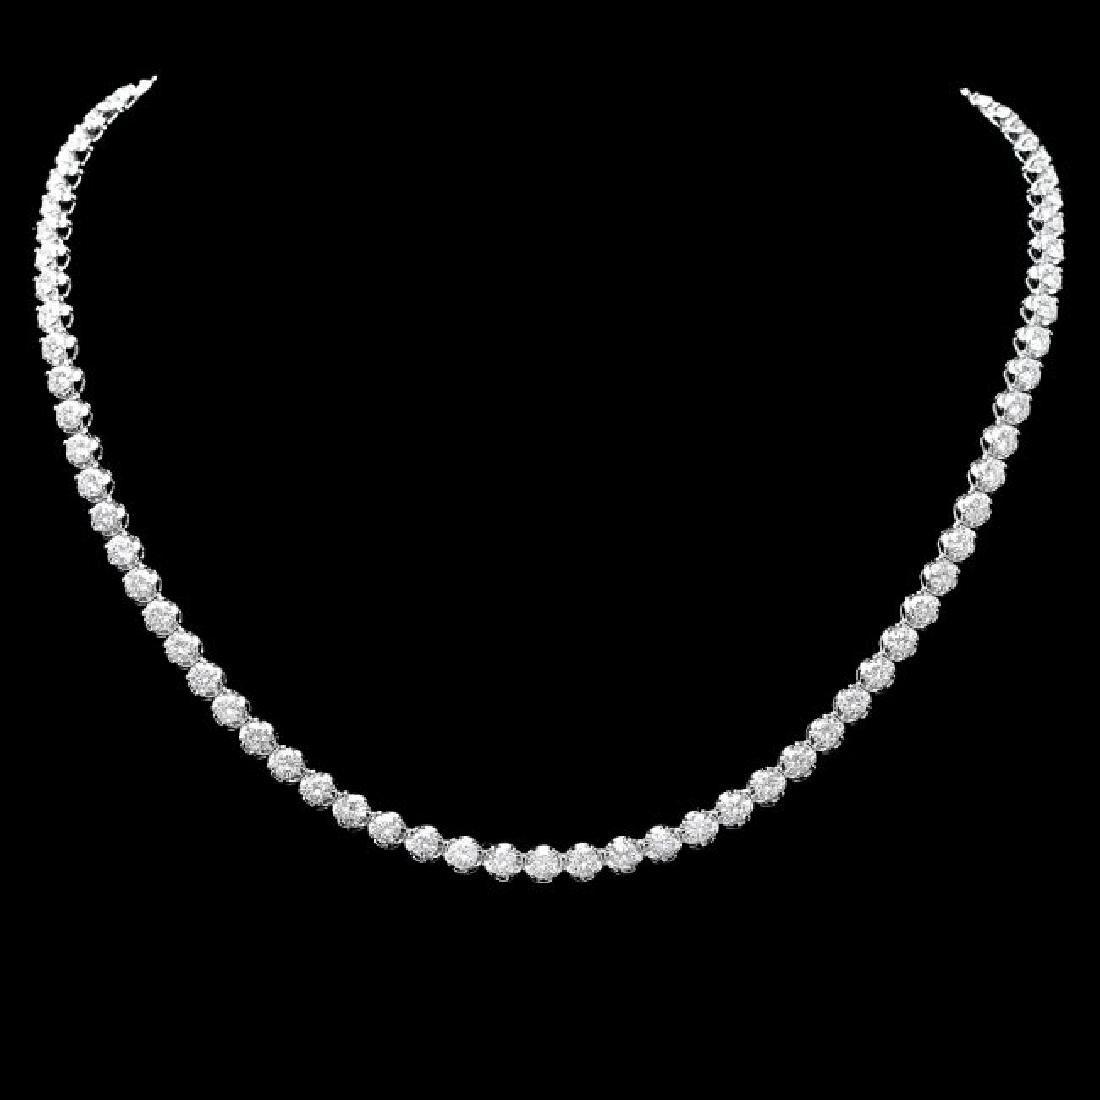 18k White Gold 14.00ct Diamond Necklace